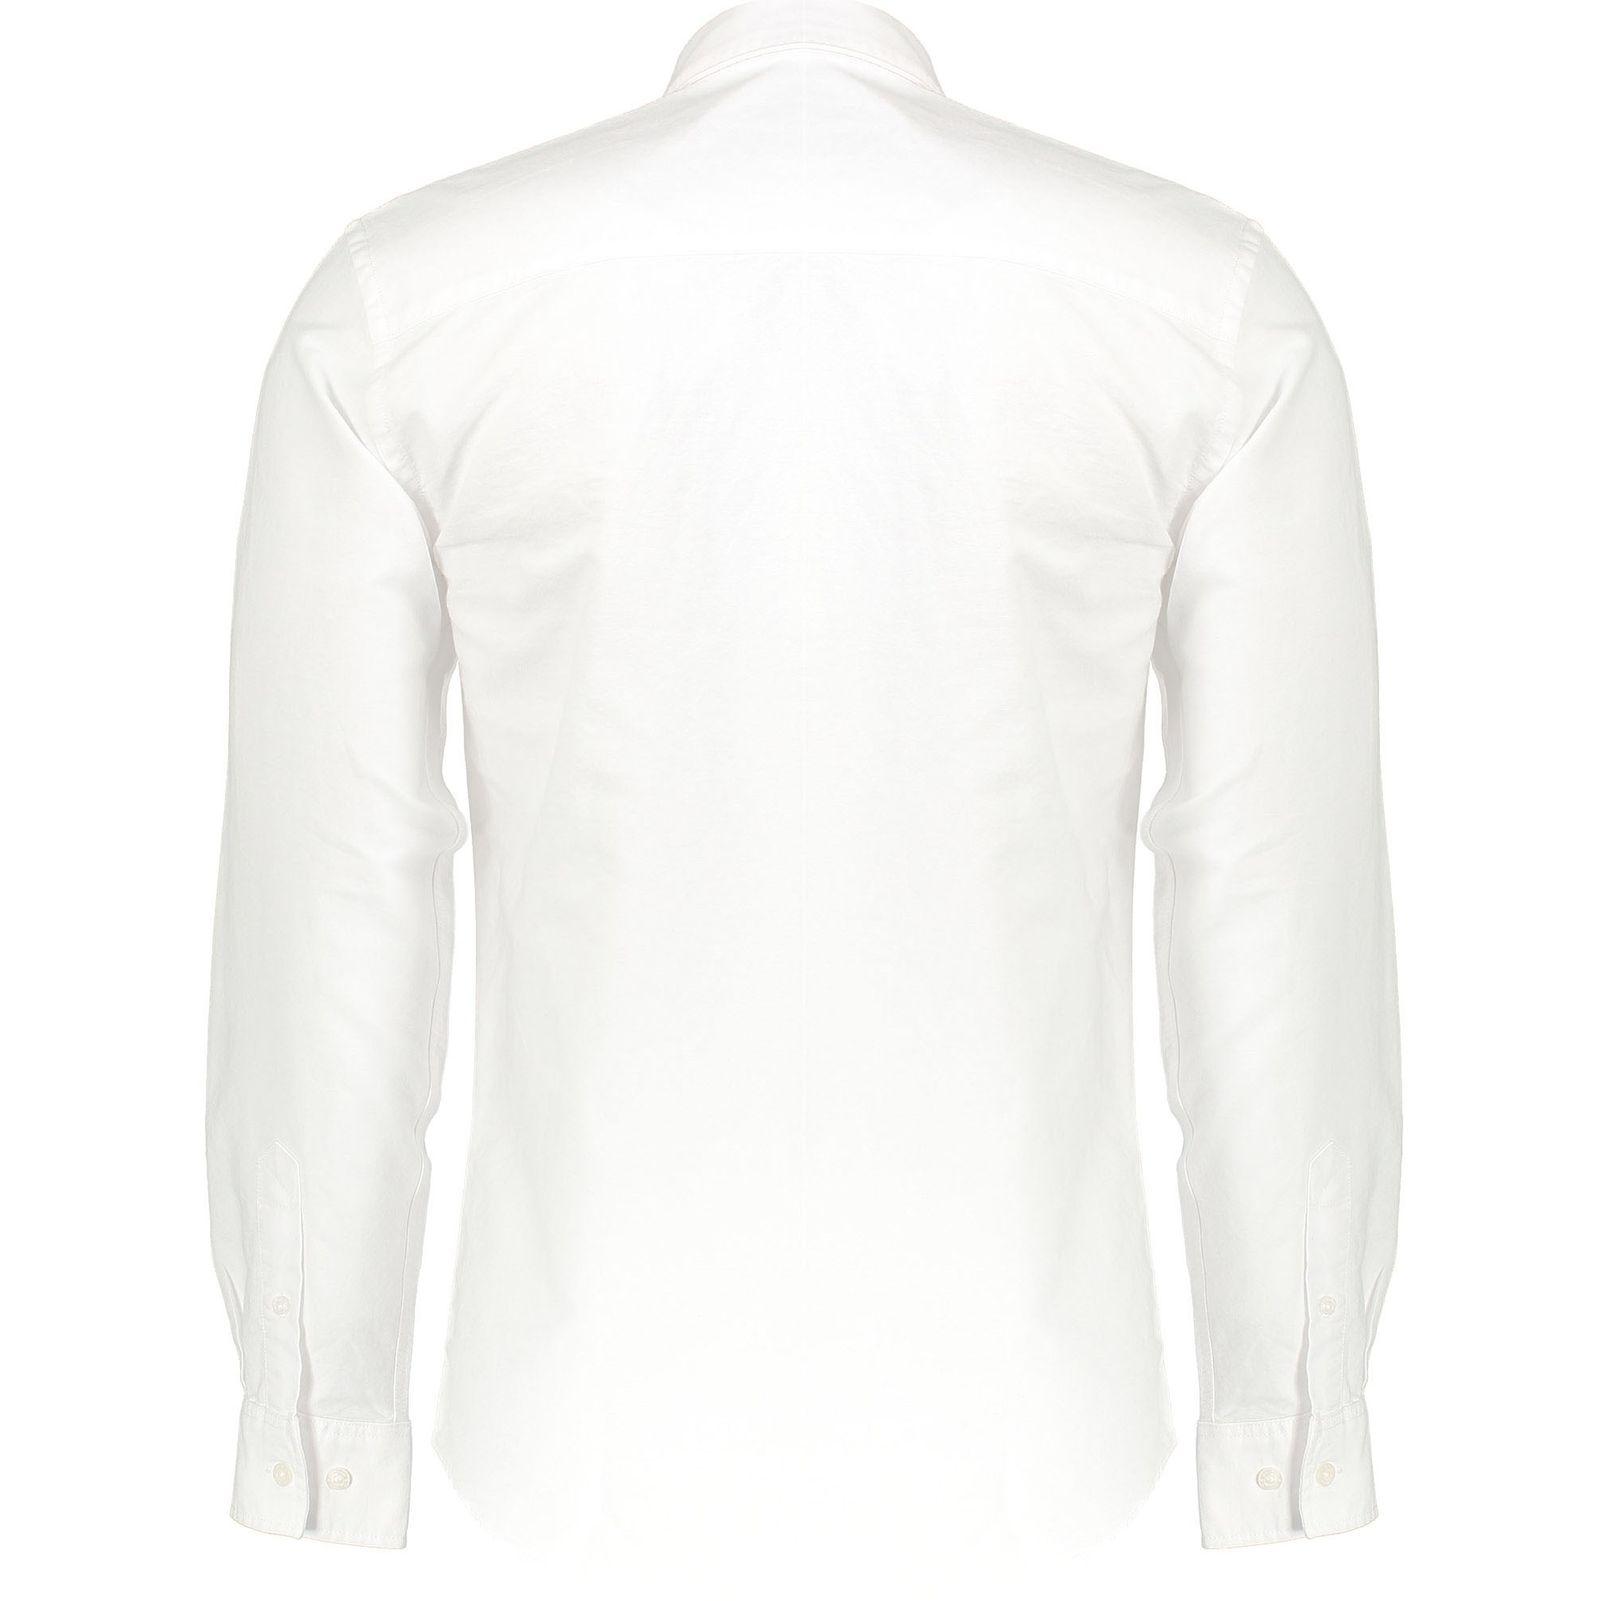 پیراهن نخی آستین بلند مردانه Jay 2.0 - مینیموم - سفيد - 2